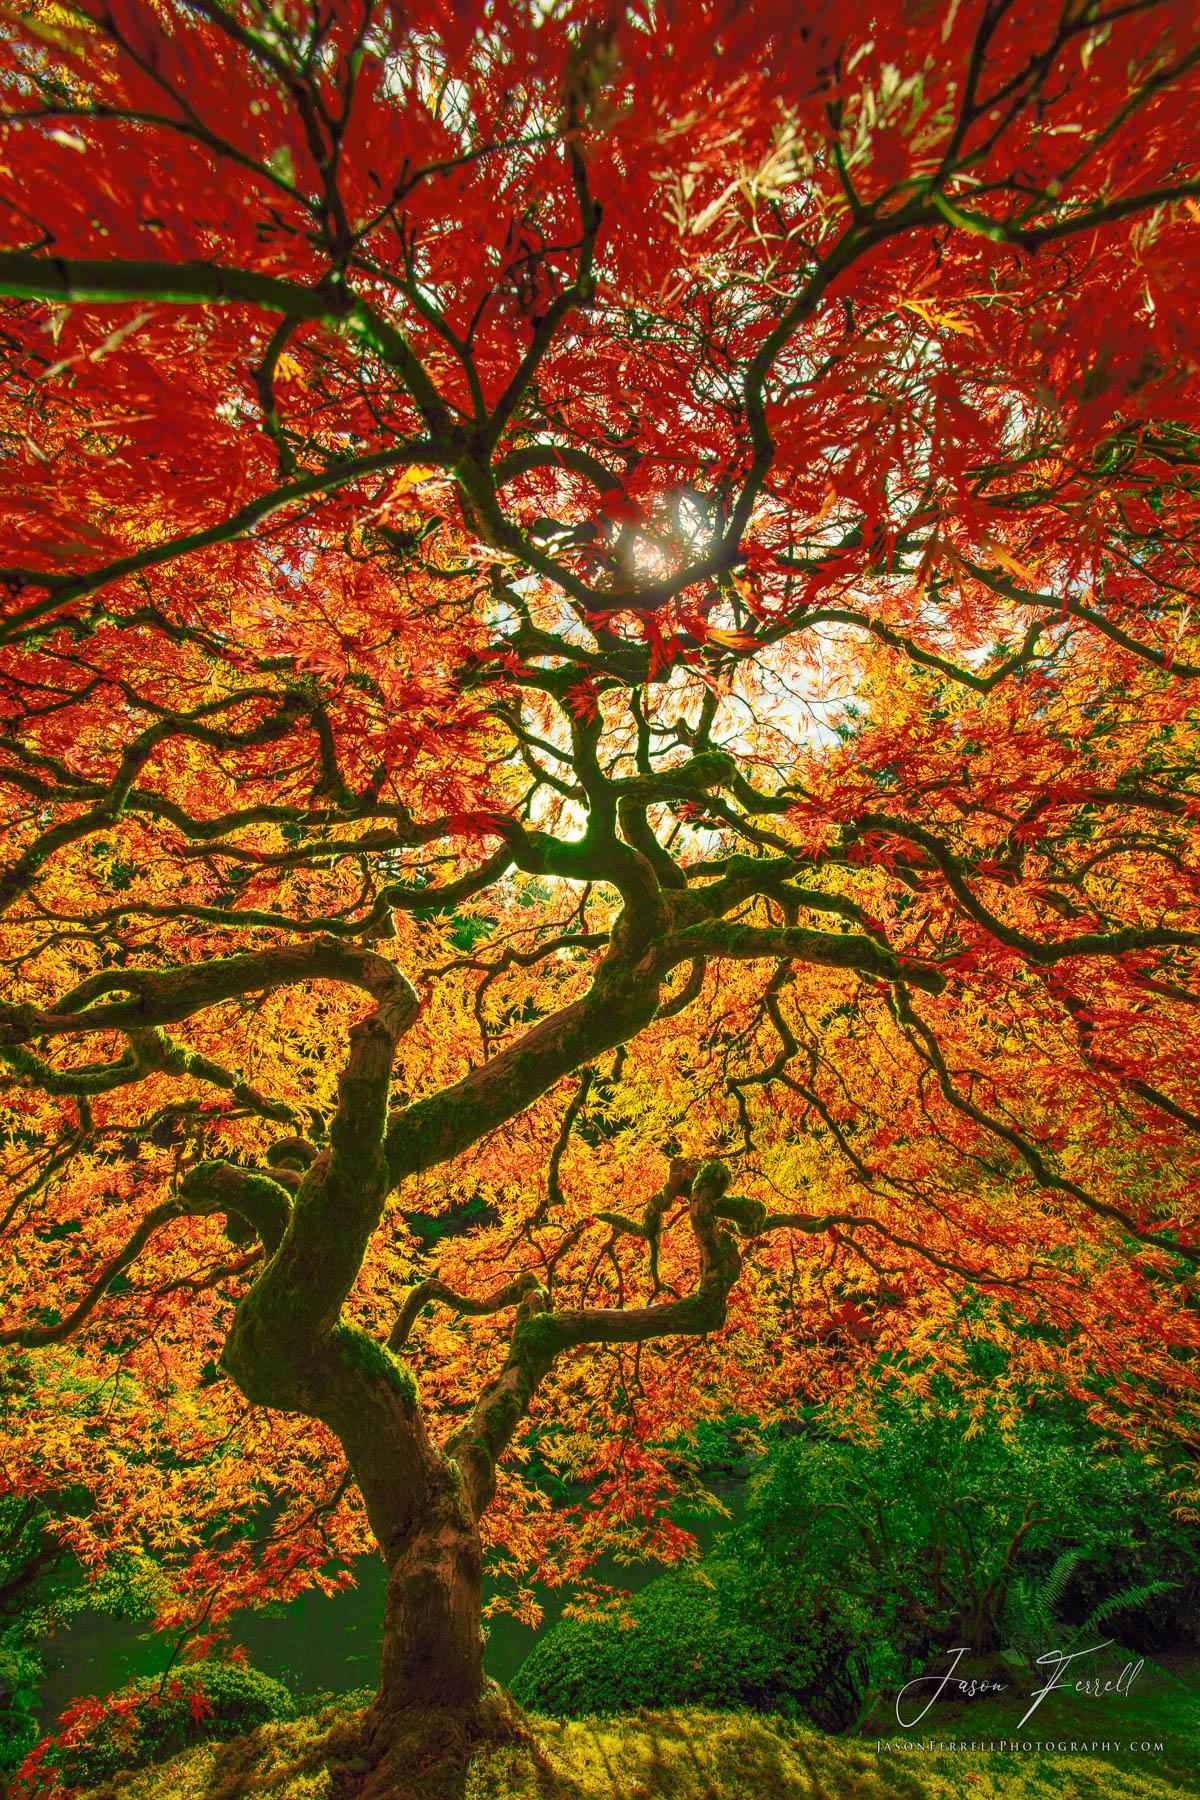 lightning strike, tree, portland japanese garden, oregon, photo